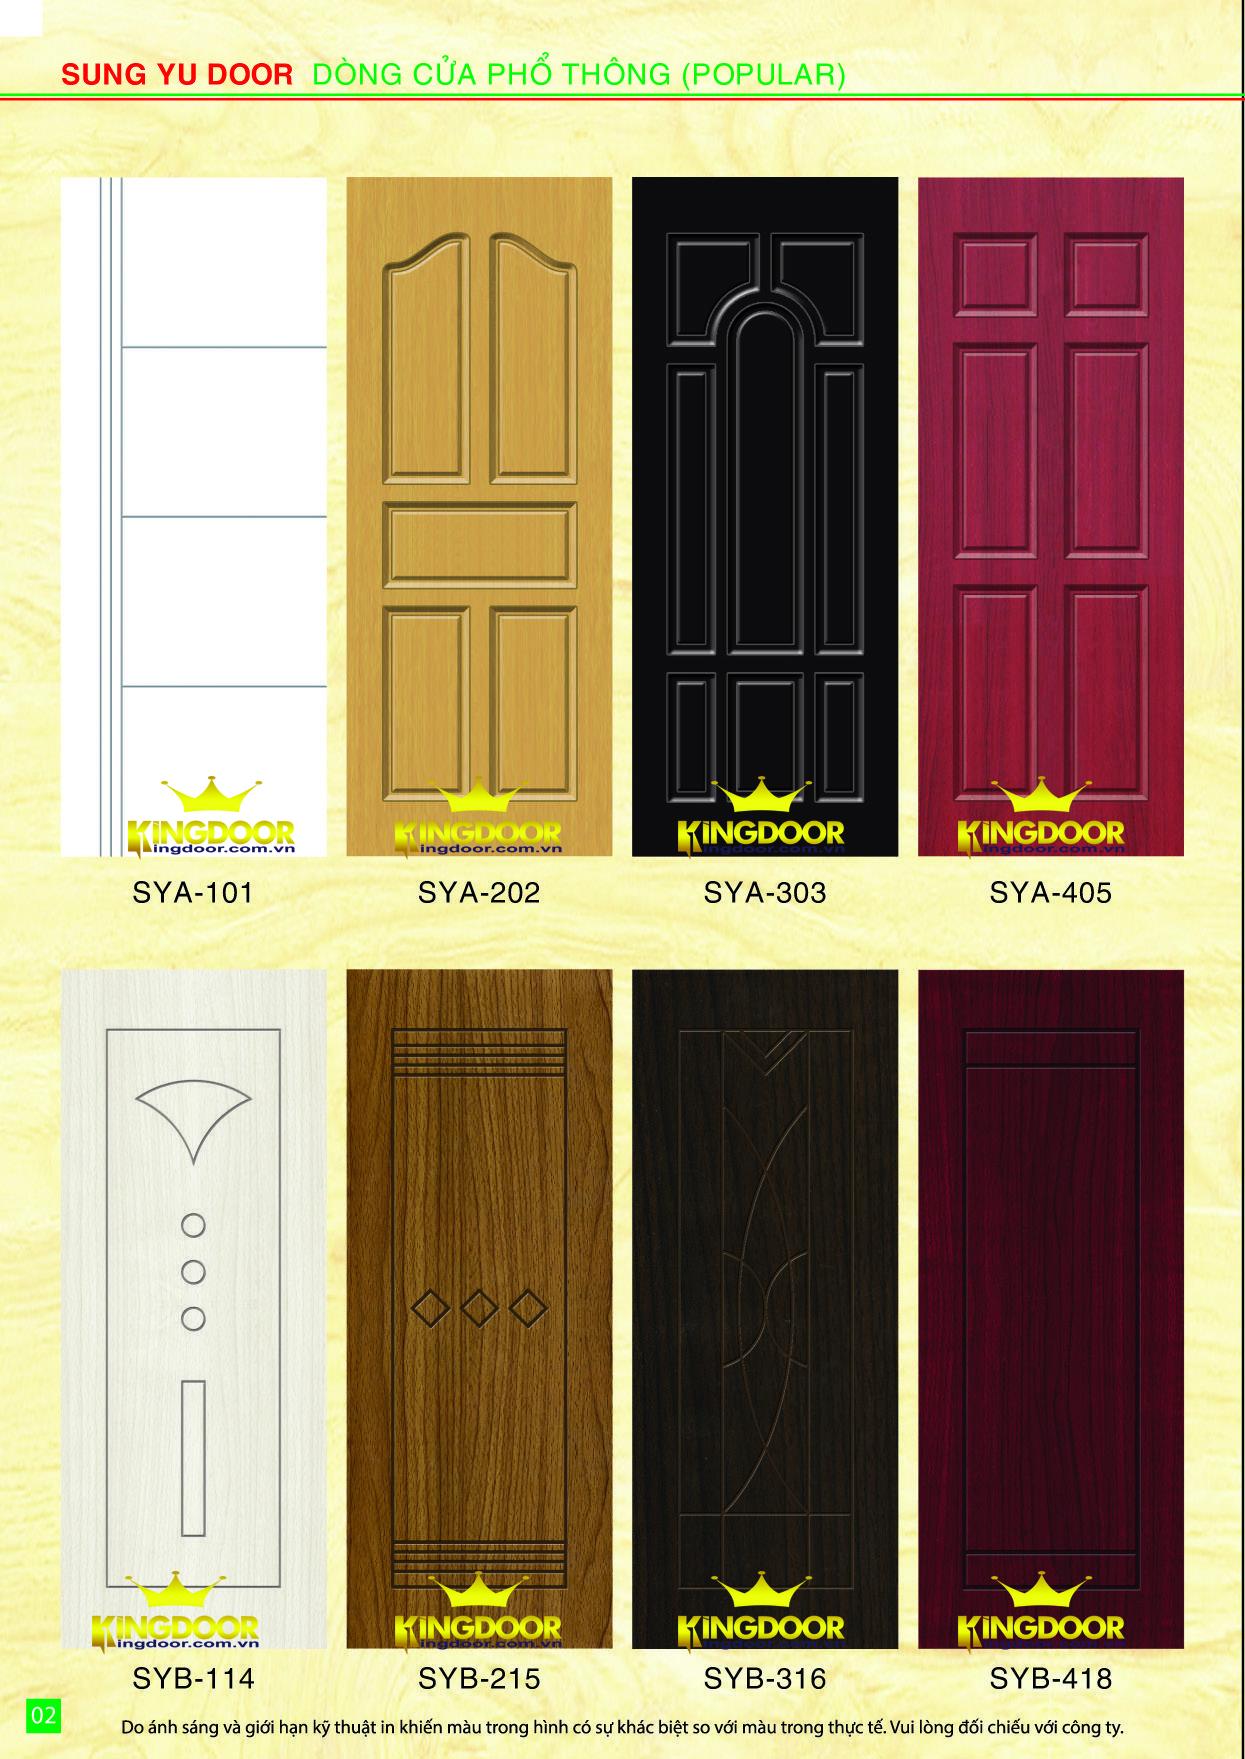 Mẫu cửa nhựa composite đẹp tại tp hcm, cửa nhựa gỗ sungyu